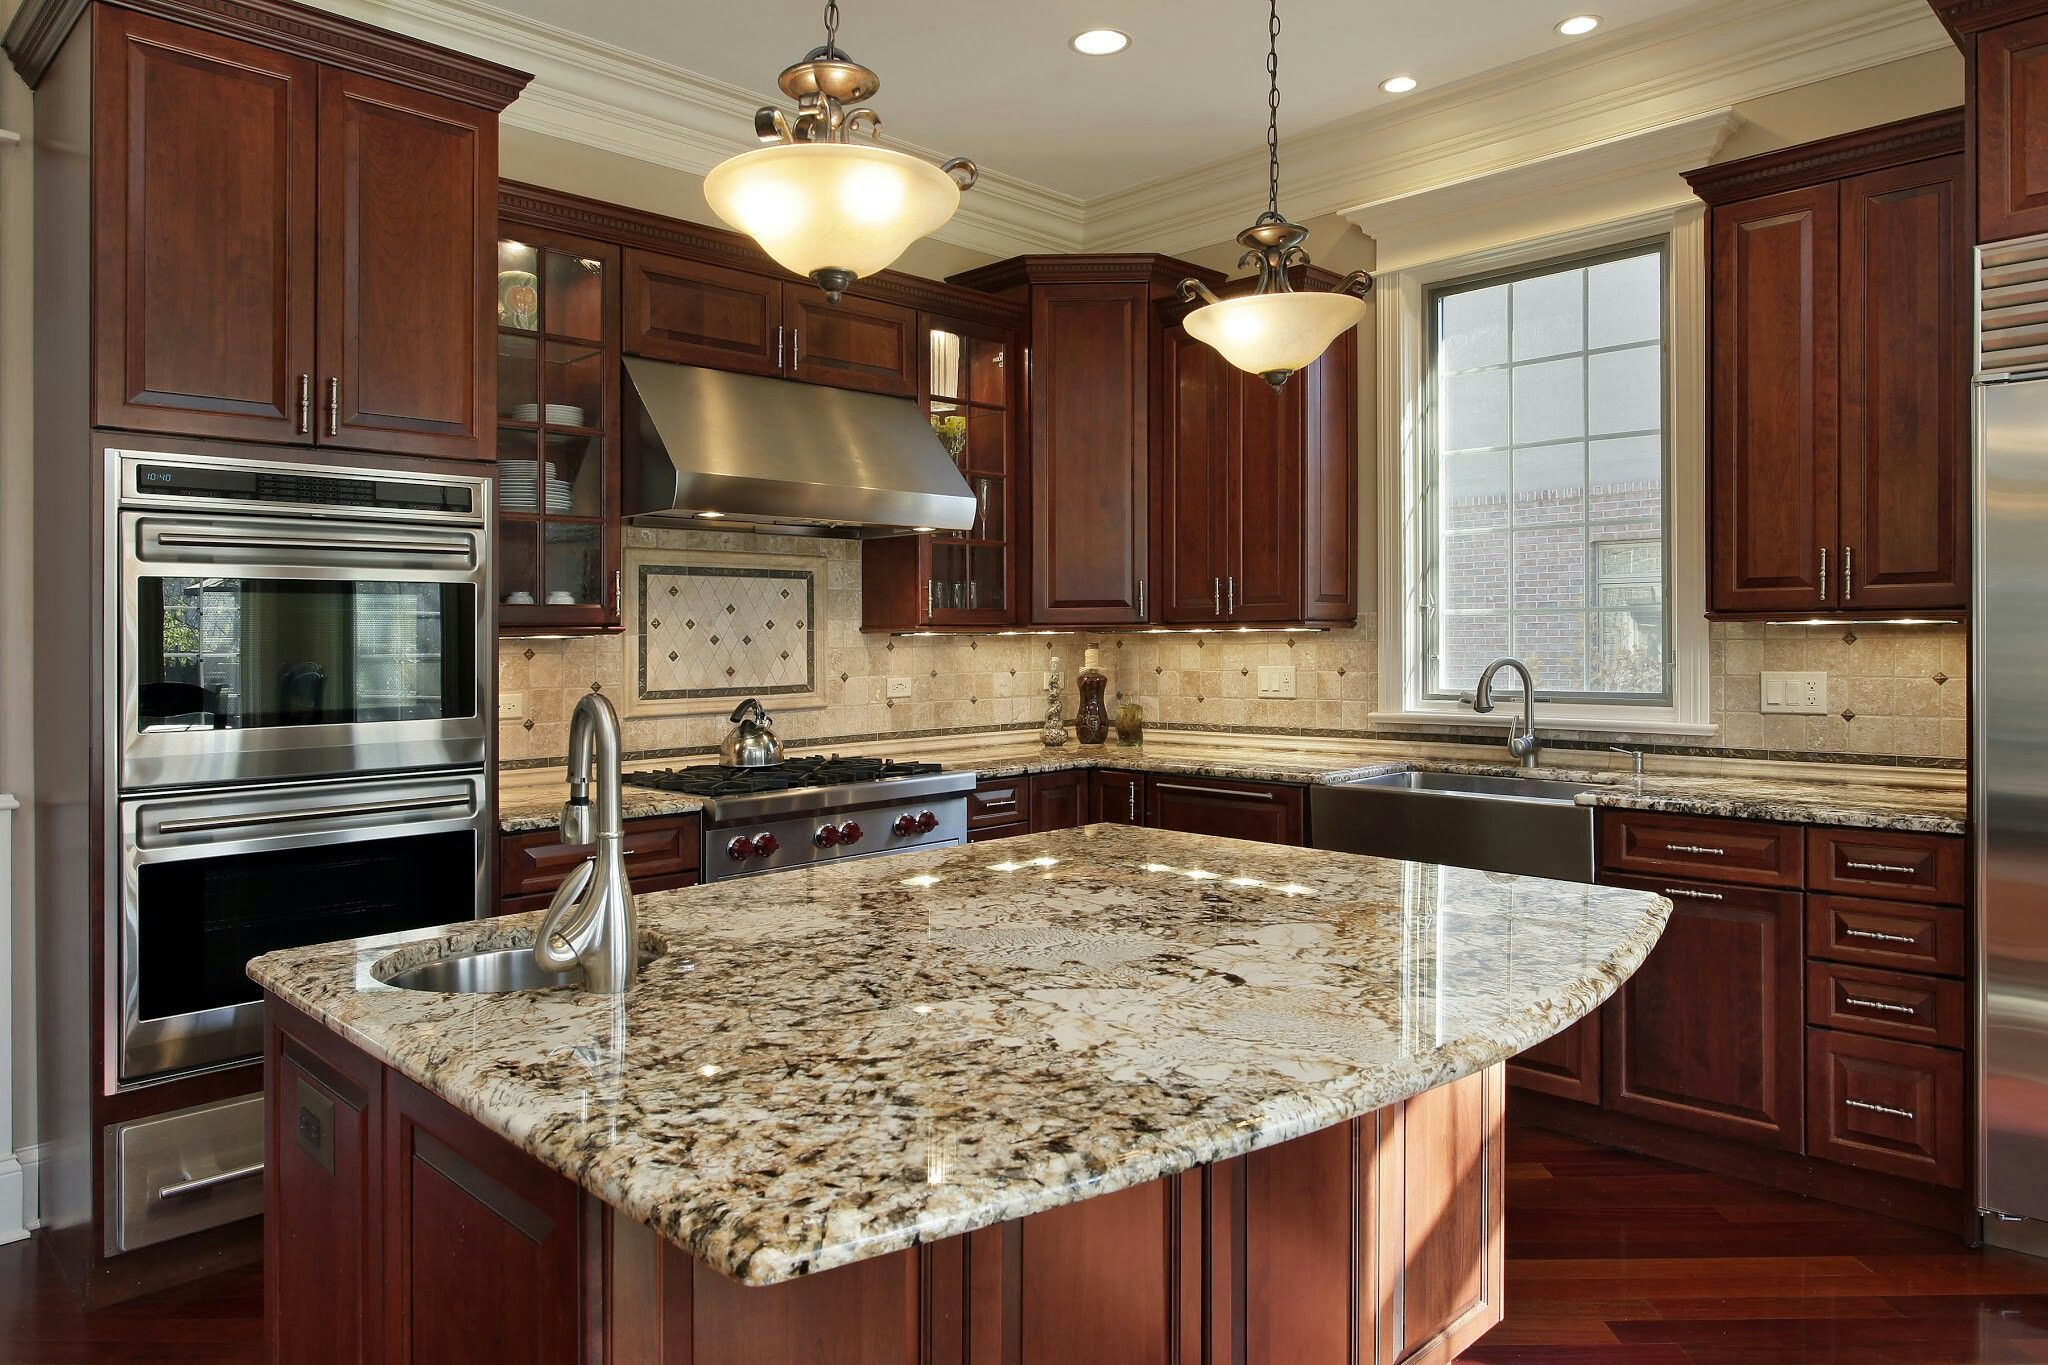 Kitchen Design Granite Cool Lindaleeann  Lindaleeann Baileymartin Zimmermanbananas Decorating Inspiration